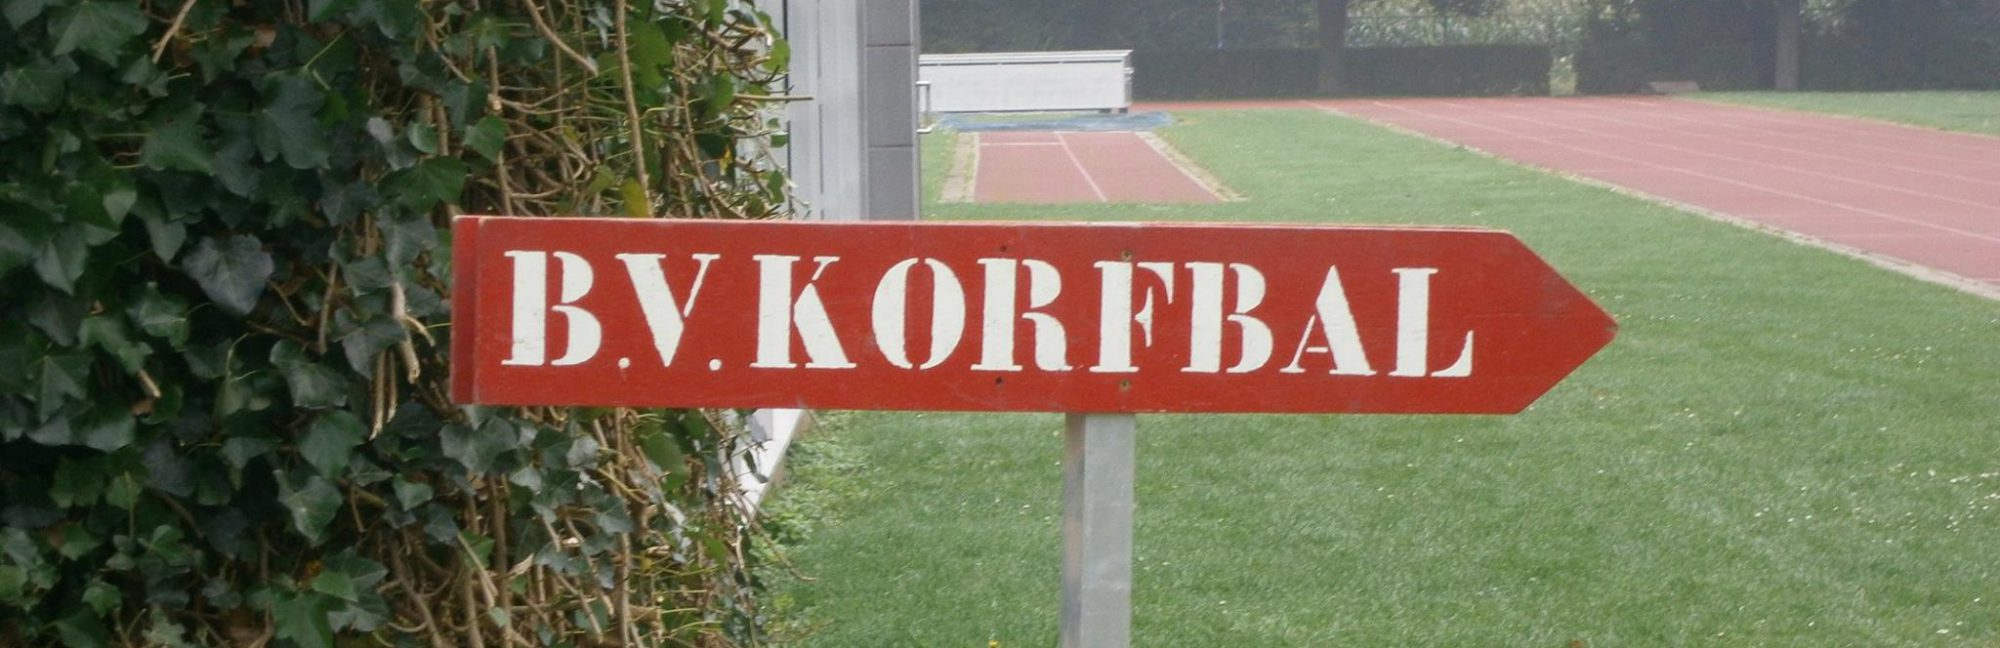 Boechout-Vremde korfbalclub